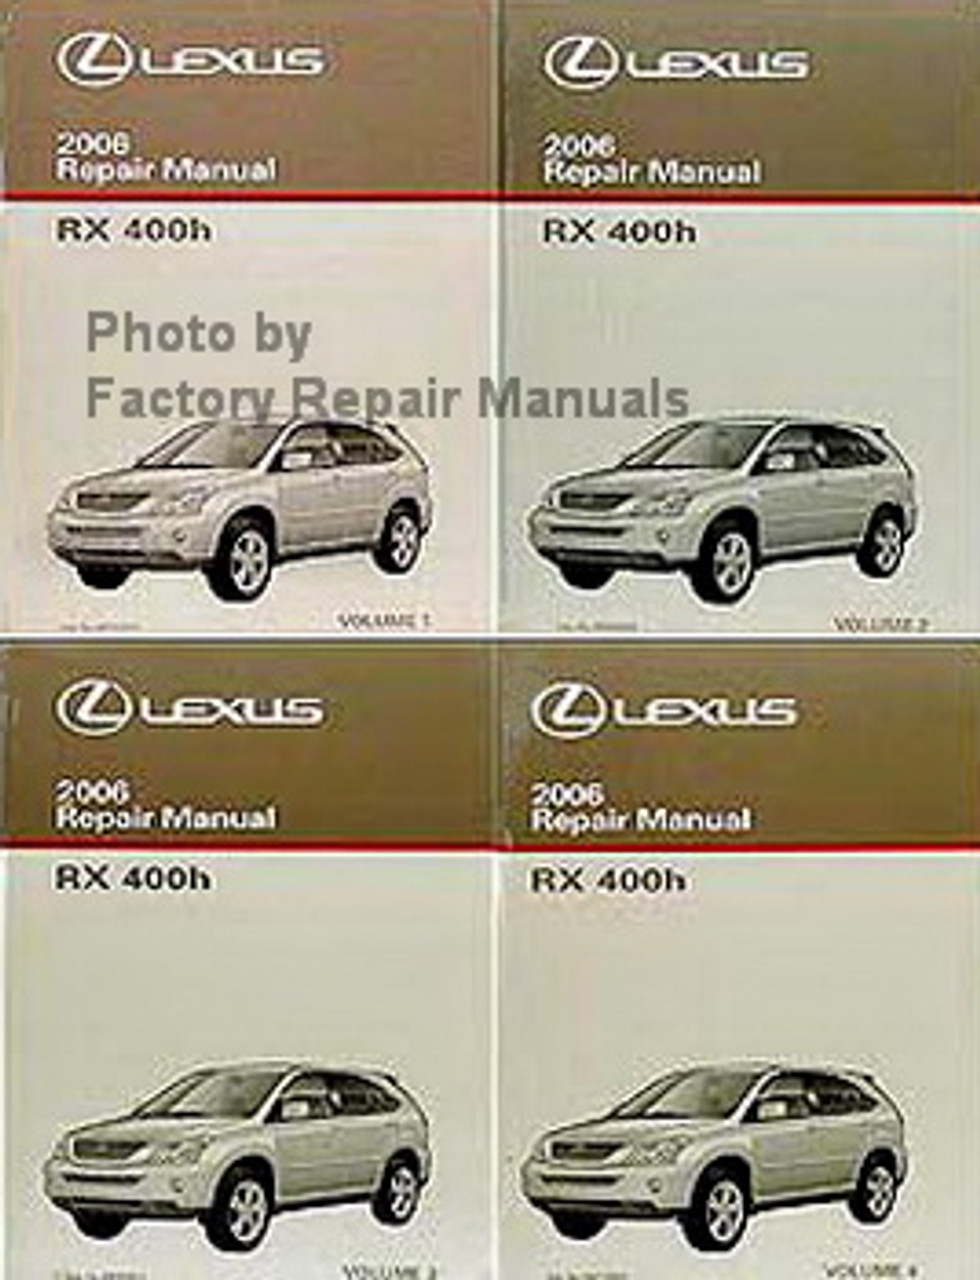 2006 Lexus Rx400h Factory Service Manual Set Original Shop Repair Factory Repair Manuals